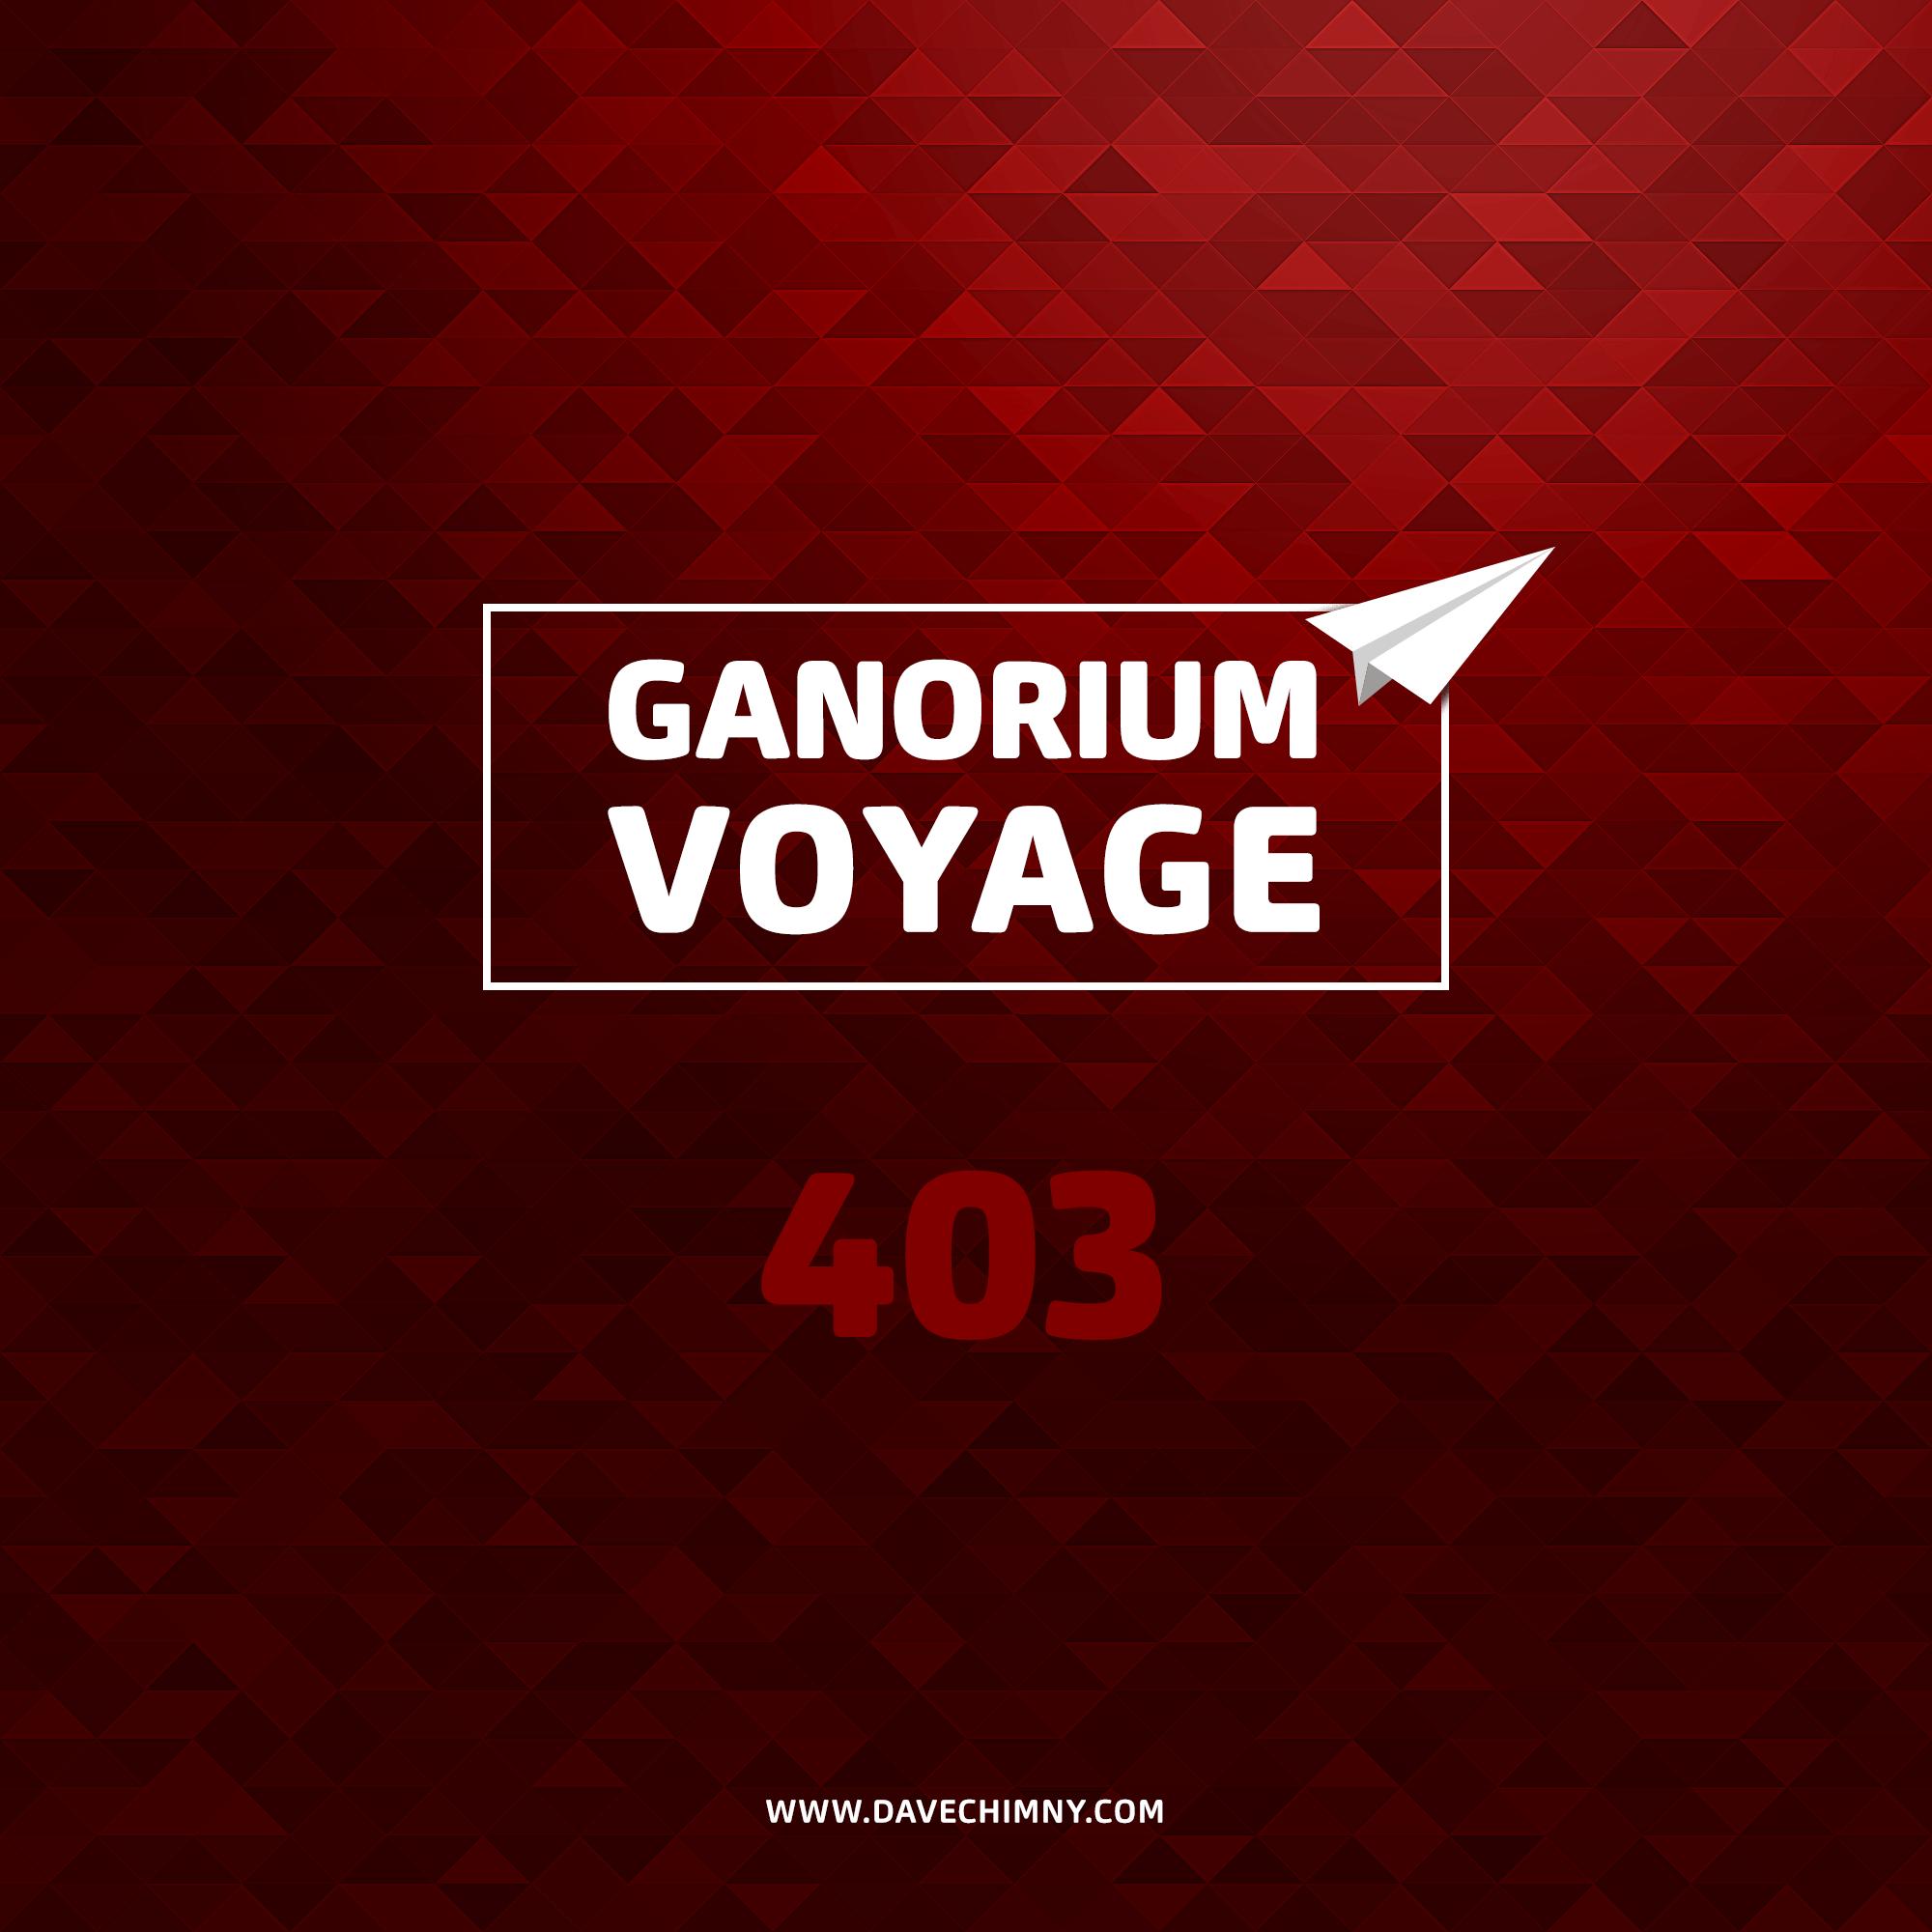 Dave Chimny - Ganorium Voyage 403